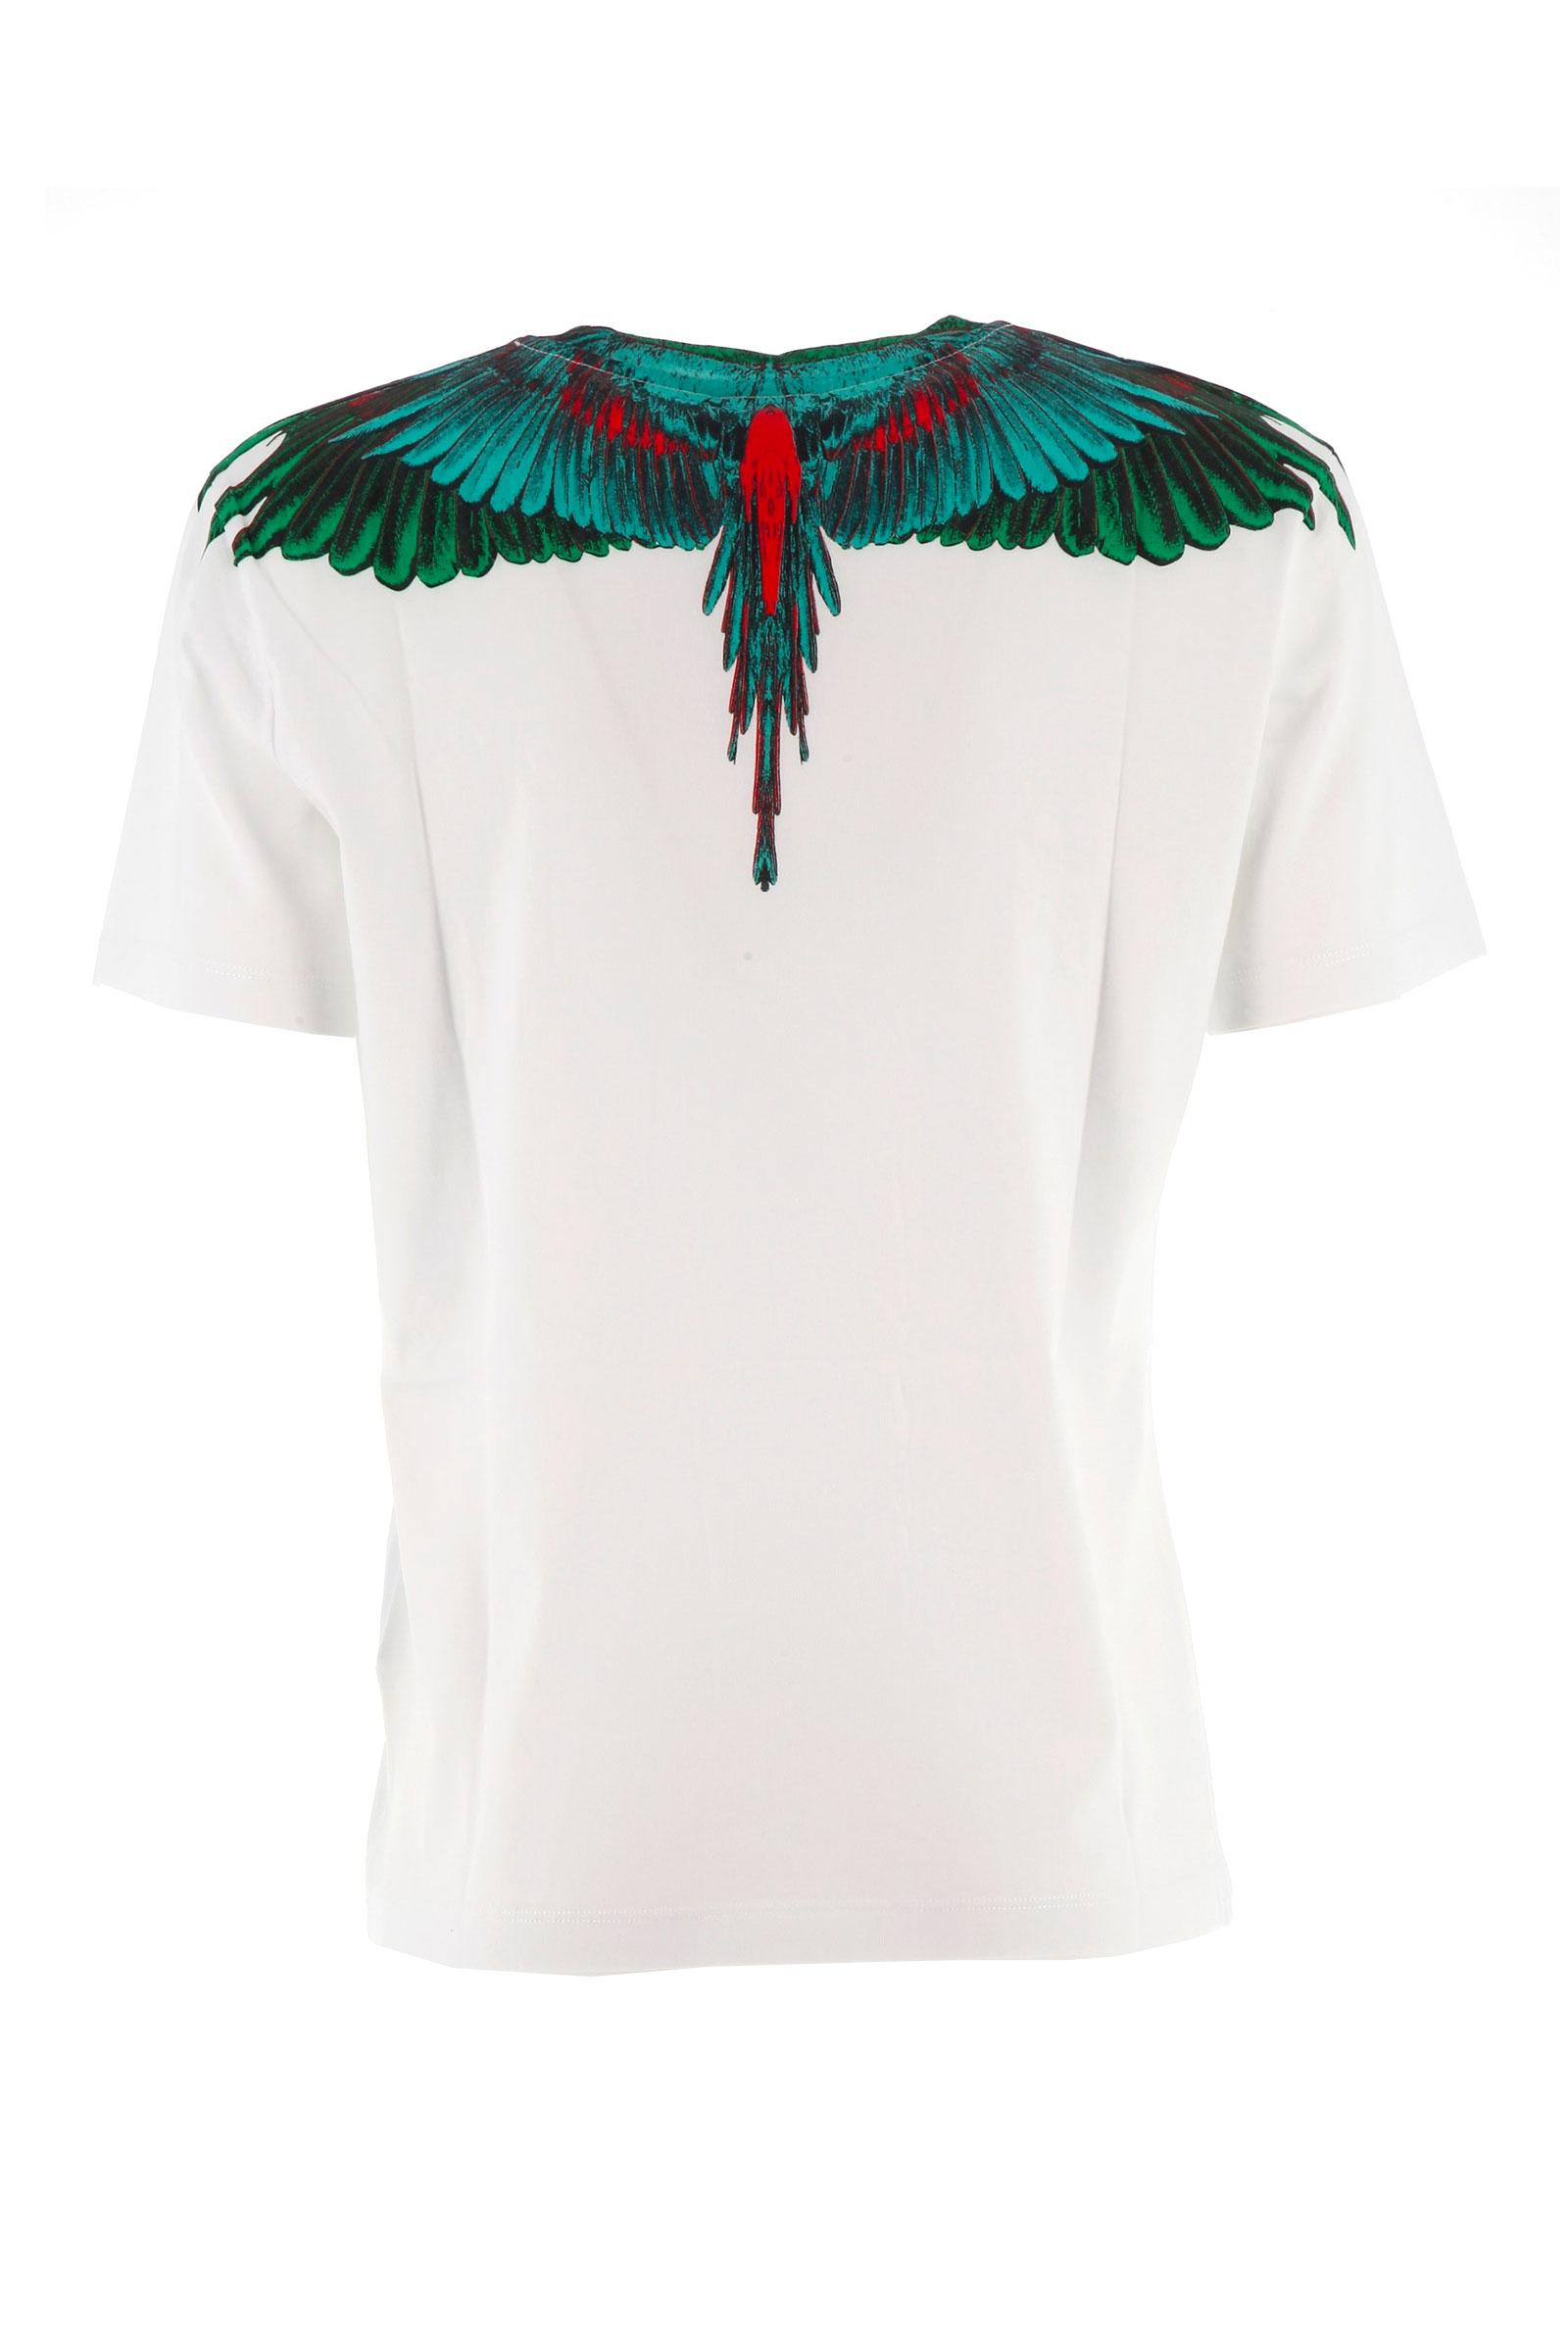 T-shirt MARCELO BURLON KIDS OF MILAN | T-shirt | BMB11080010B000